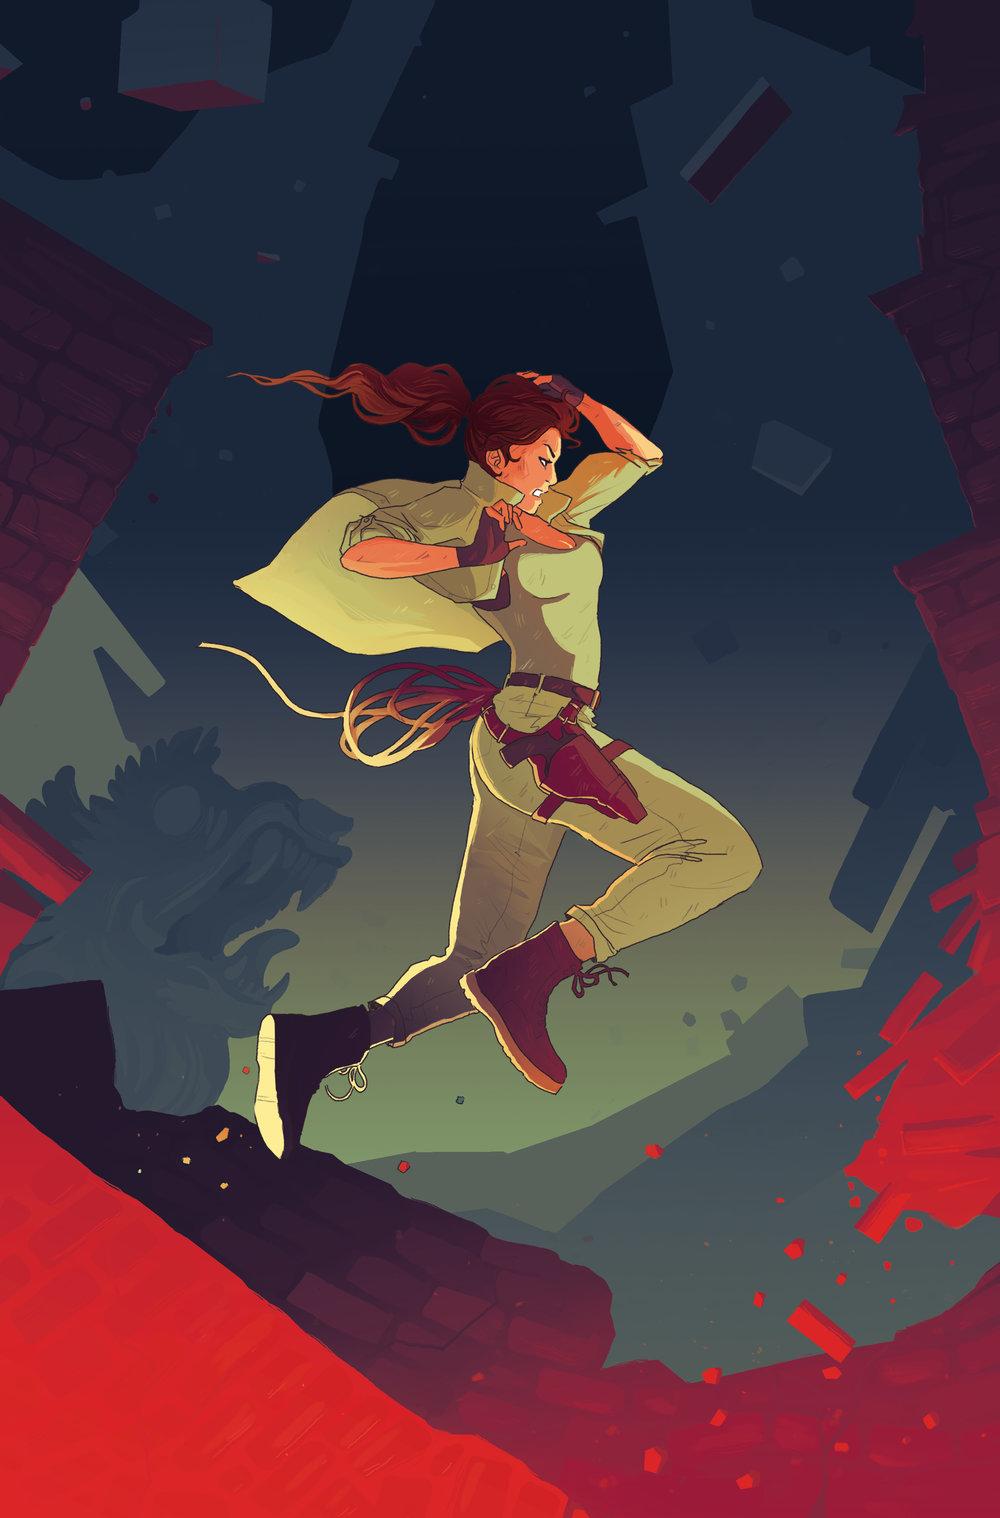 Cover  - Tomb Raider: Survivor's Crusade  #2 - Dark Horse Comics